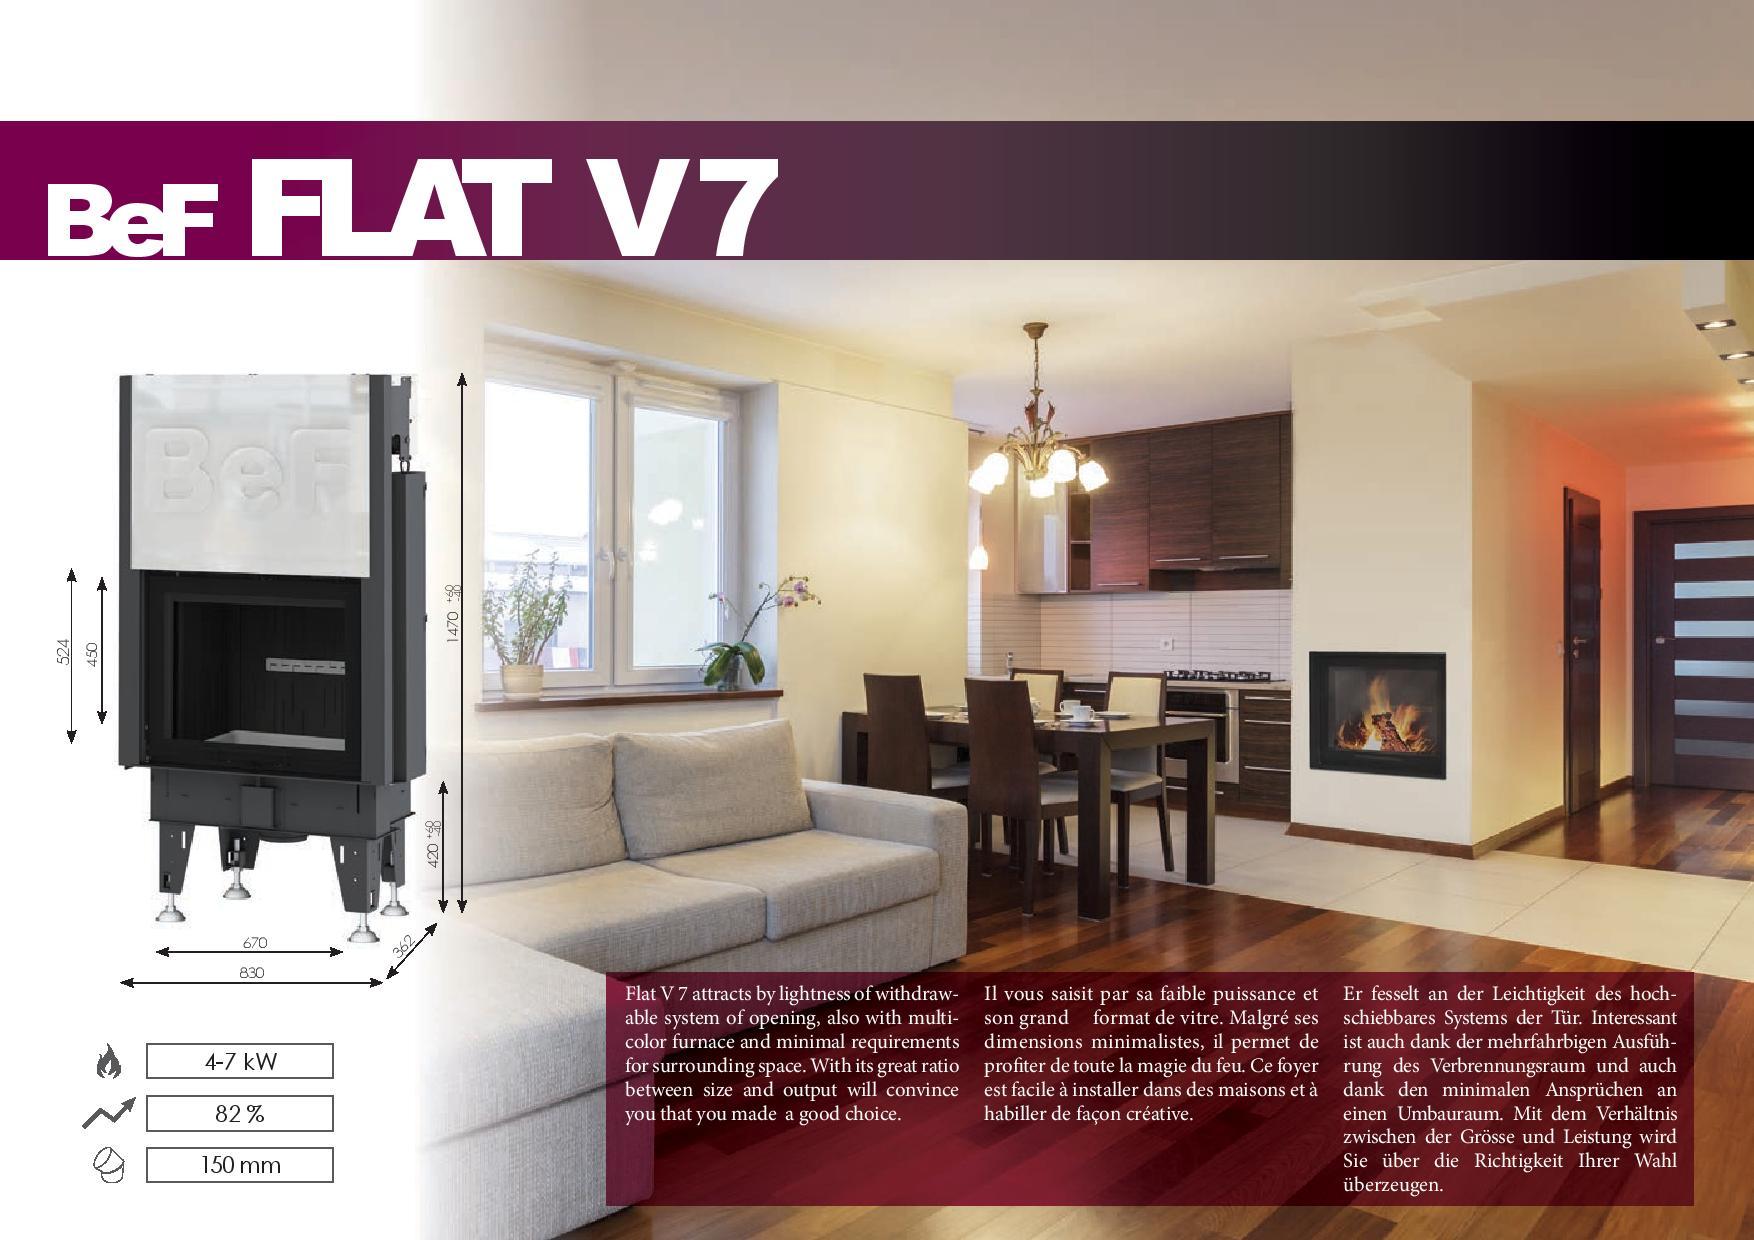 Foyers à bois FLAT BeF HOME 7 kw vitre relevable